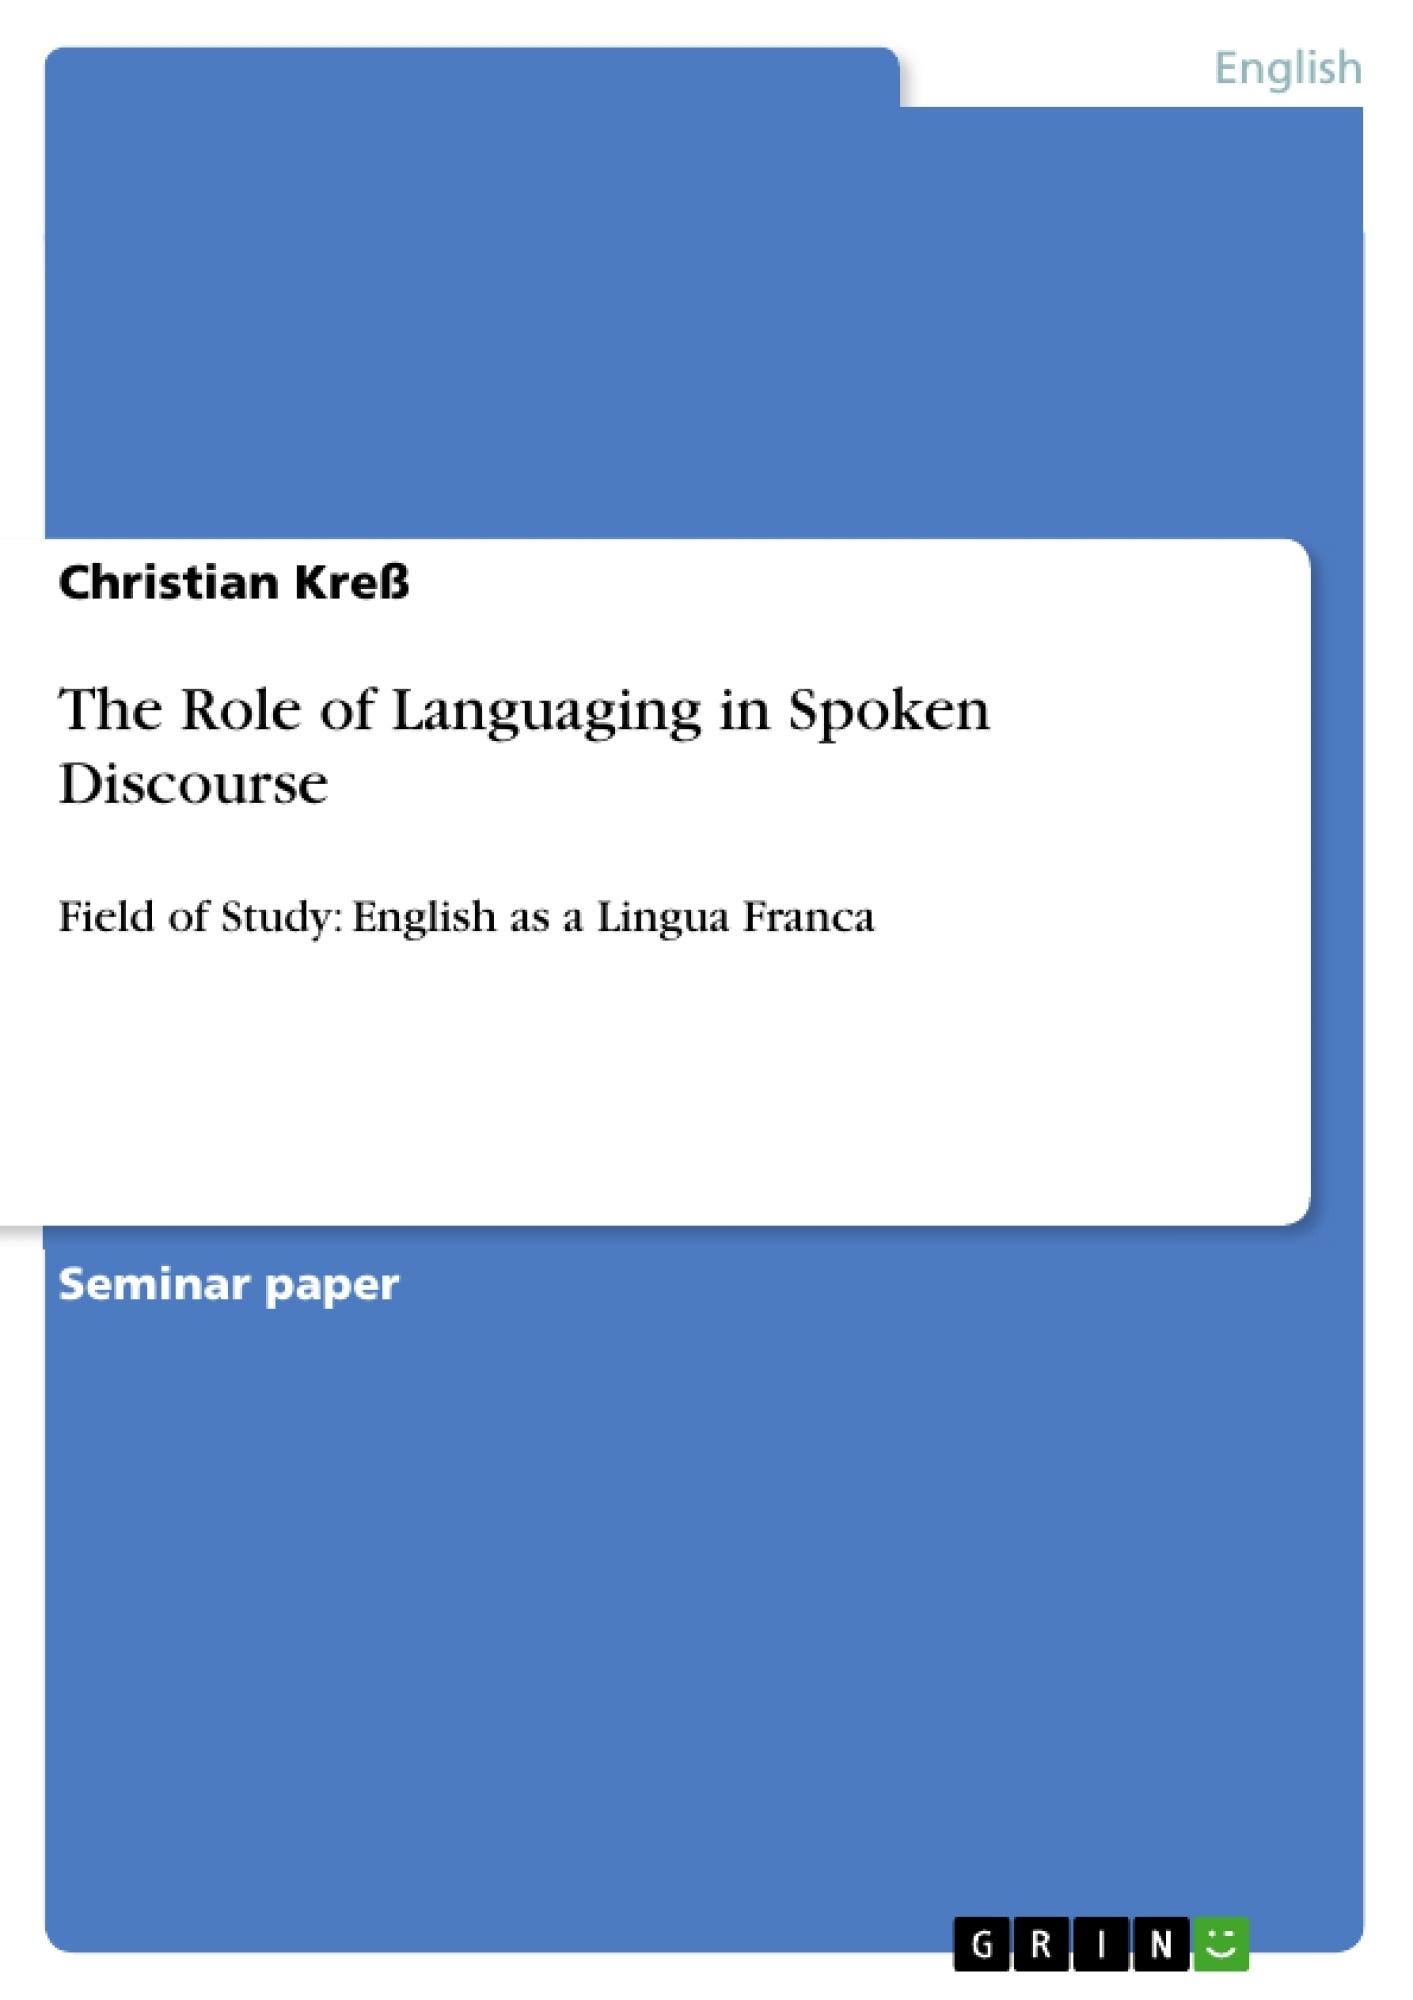 thesis about language acquisition